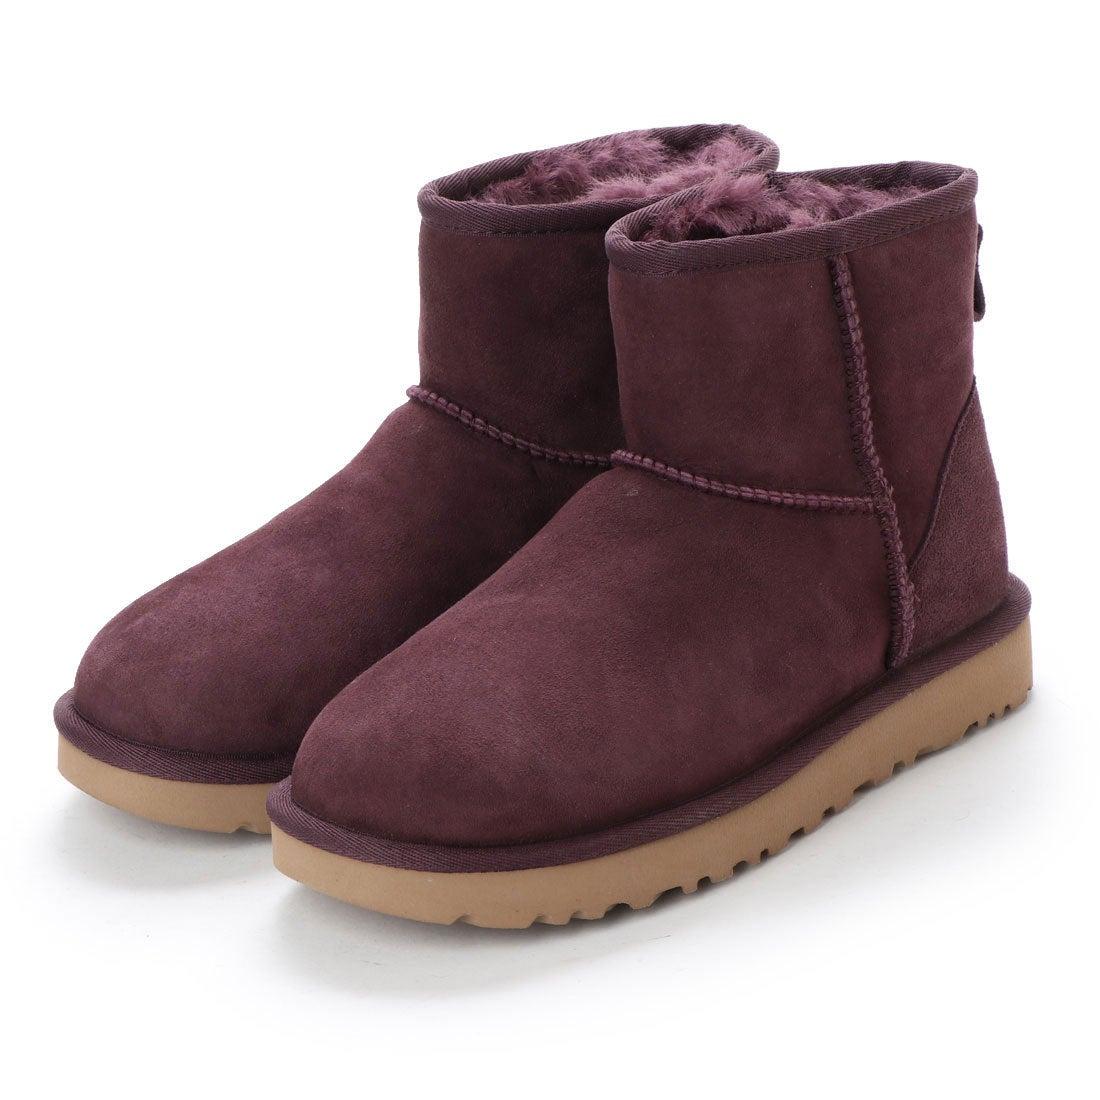 8c9c919a609 アグ UGG 1016222 W CLASSIC MINI 2 (ポート) -靴&ファッション通販 ...